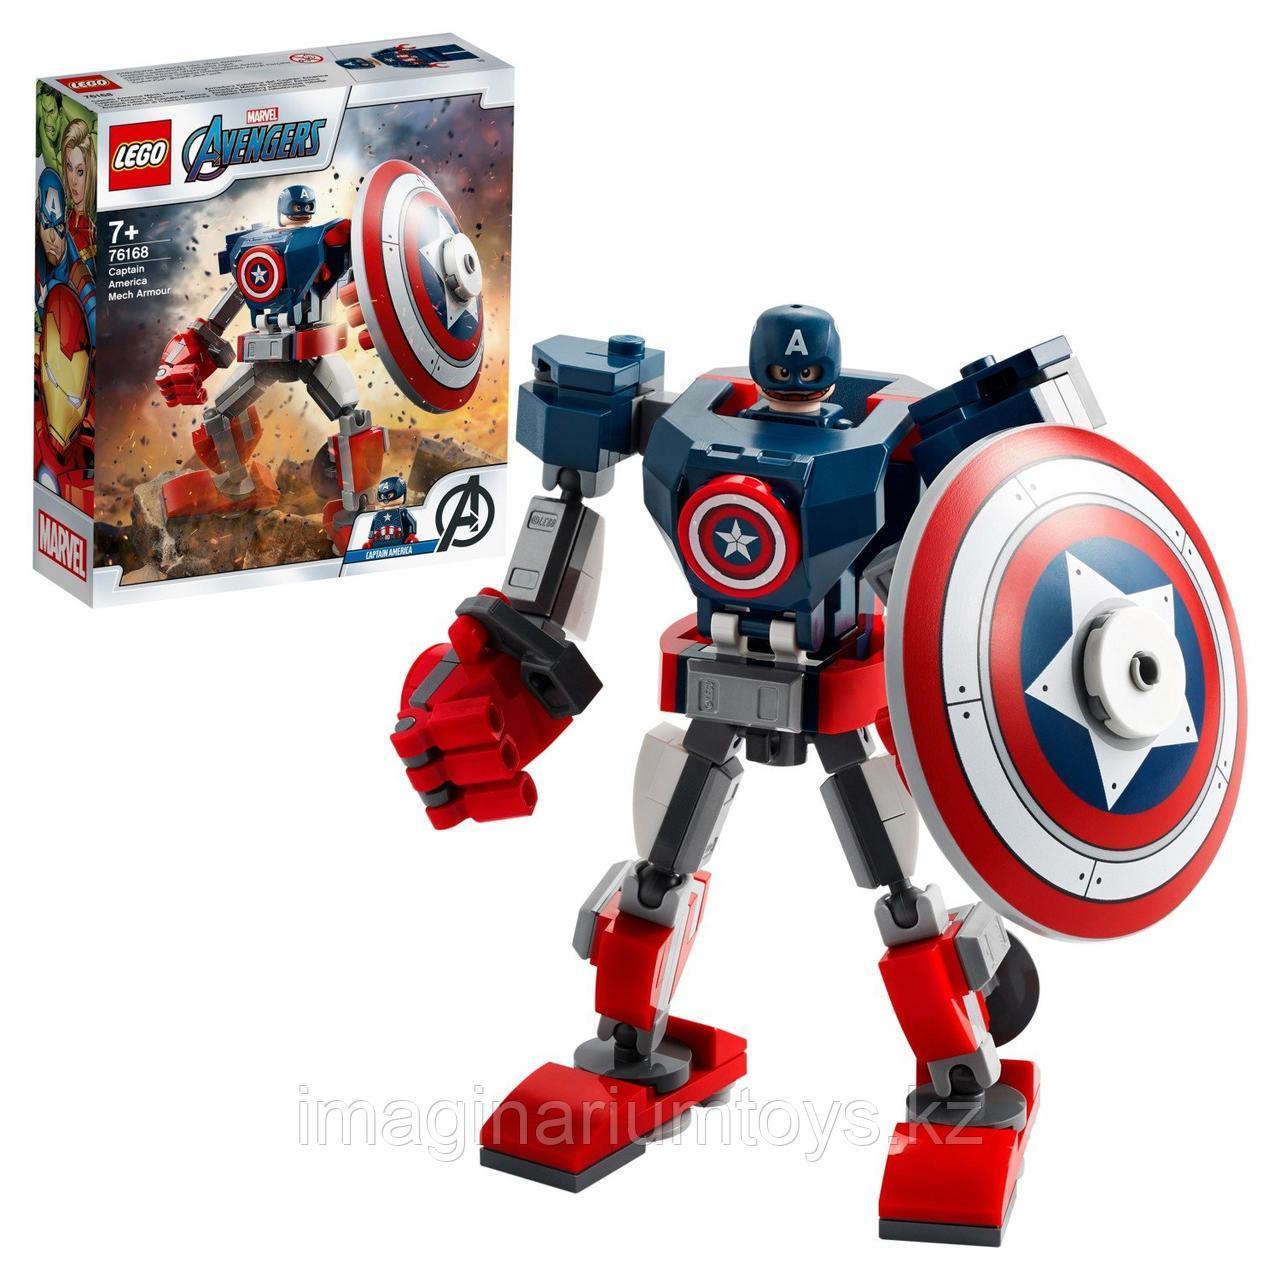 Конструктор LEGO Супер Герои «Капитан Америка Робот»